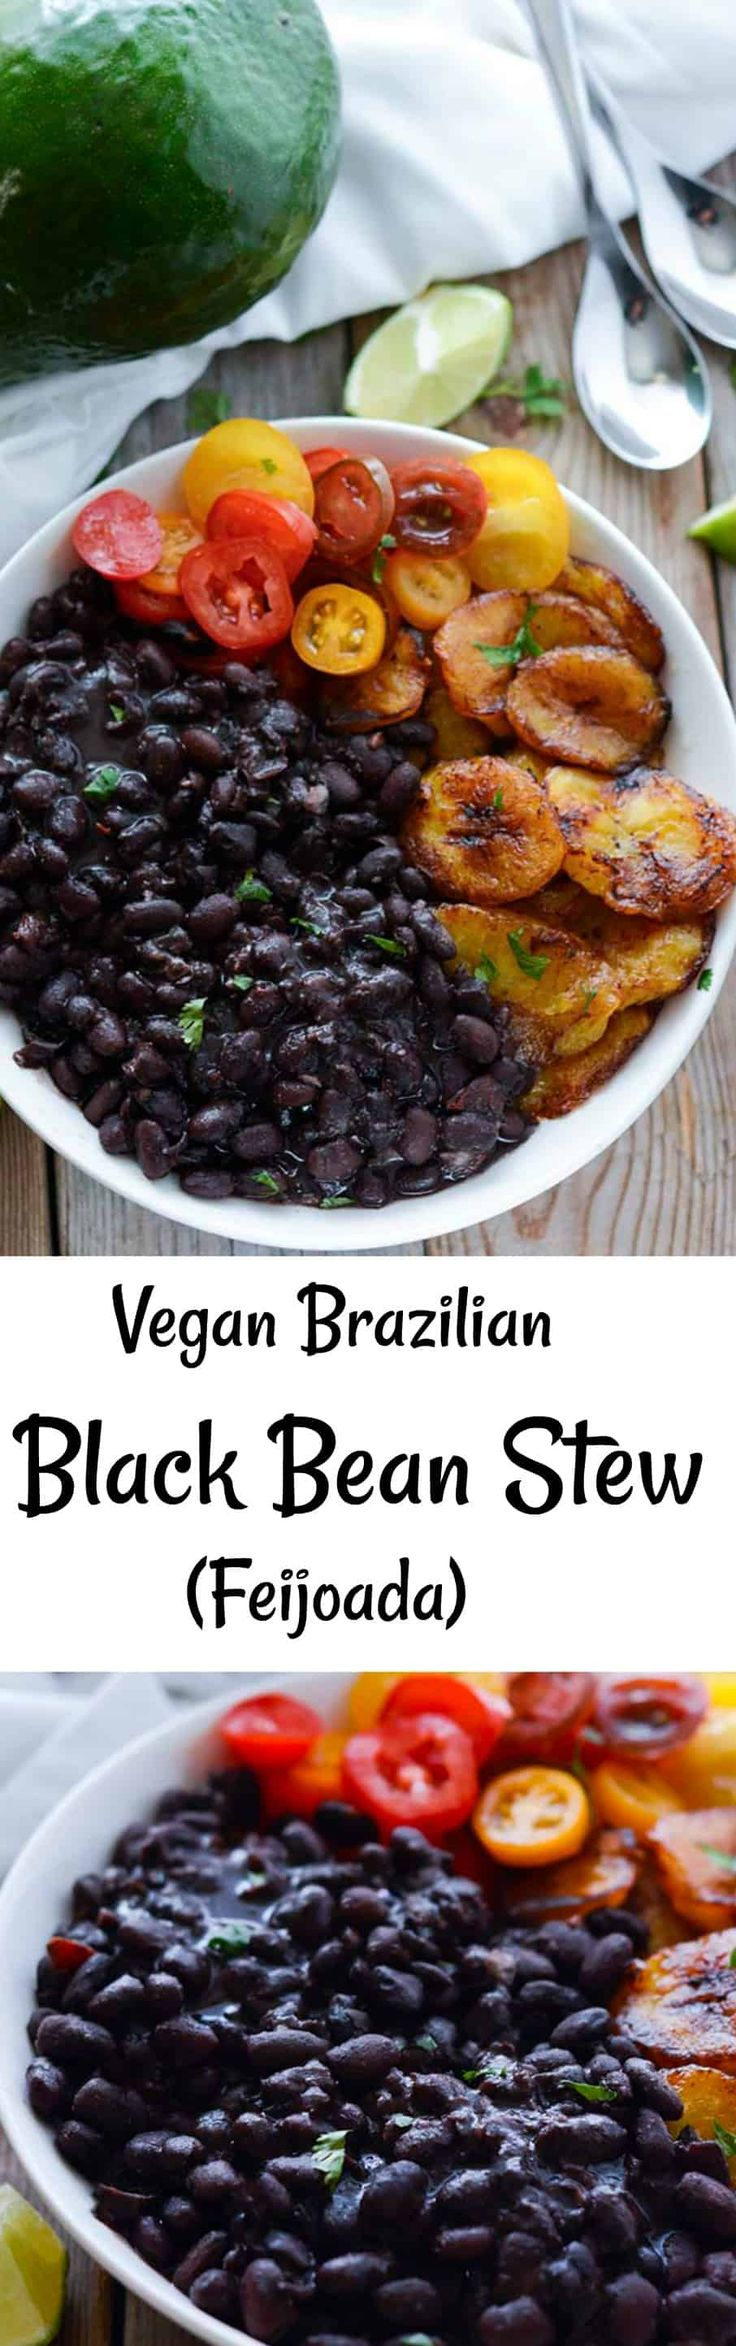 https://healthiersteps.com/recipe/vegan-brazilian-black-bean-stew-feijoada/